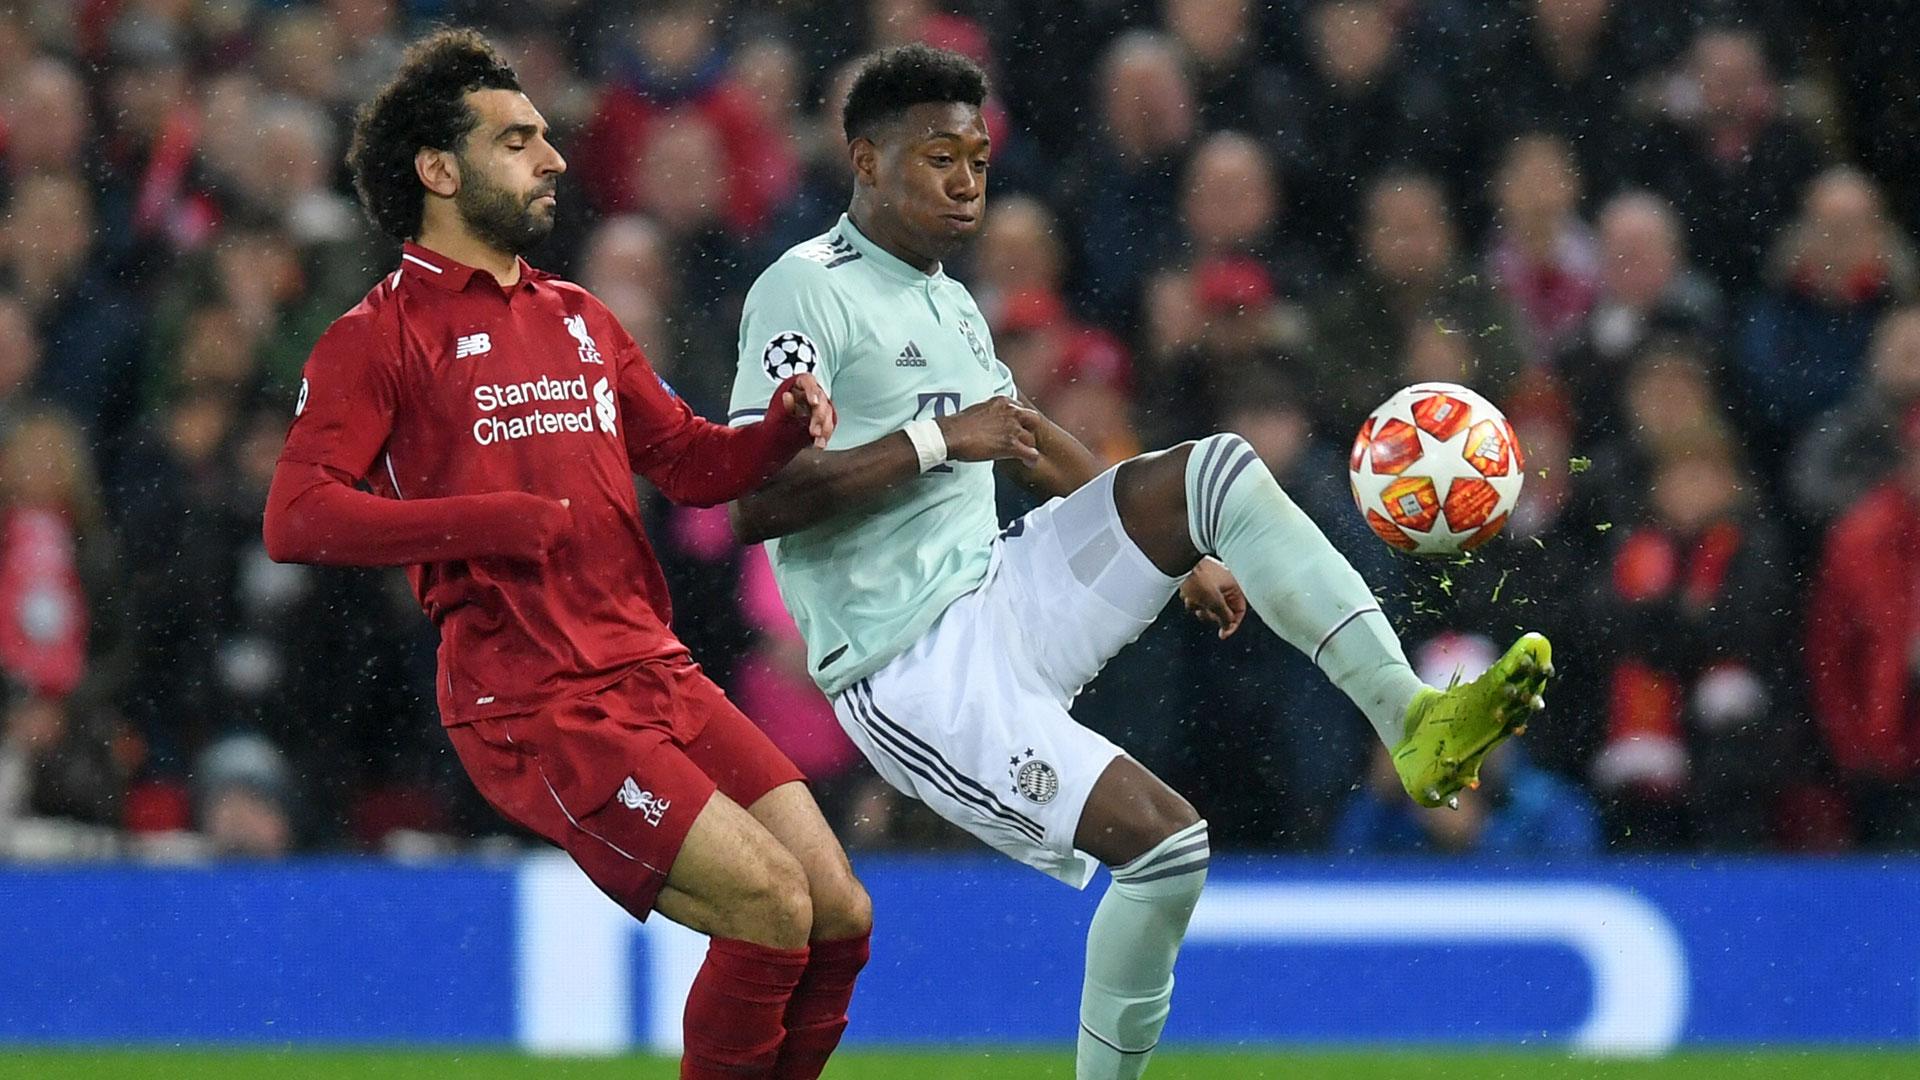 Bayern Vs Liverpool Photo: FC Liverpool Vs. FC Bayern München: Remis In Anfield